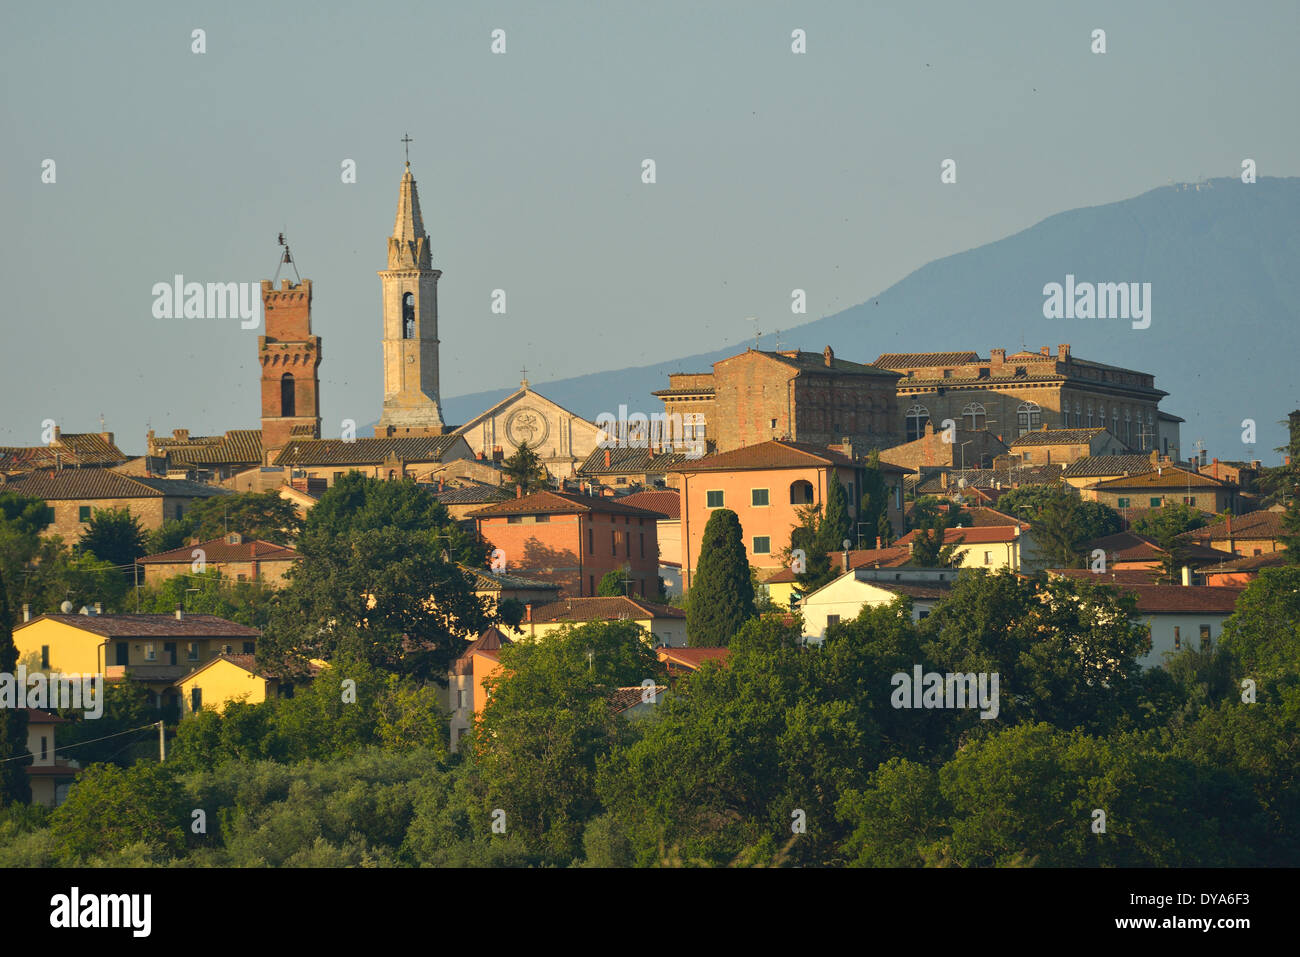 Europa mediterranen italienischen Italien Toskana Siena Provinz Pienza Dorf Stadt Hang Stuck Minarett Turm letzten leichten sunse Stockbild